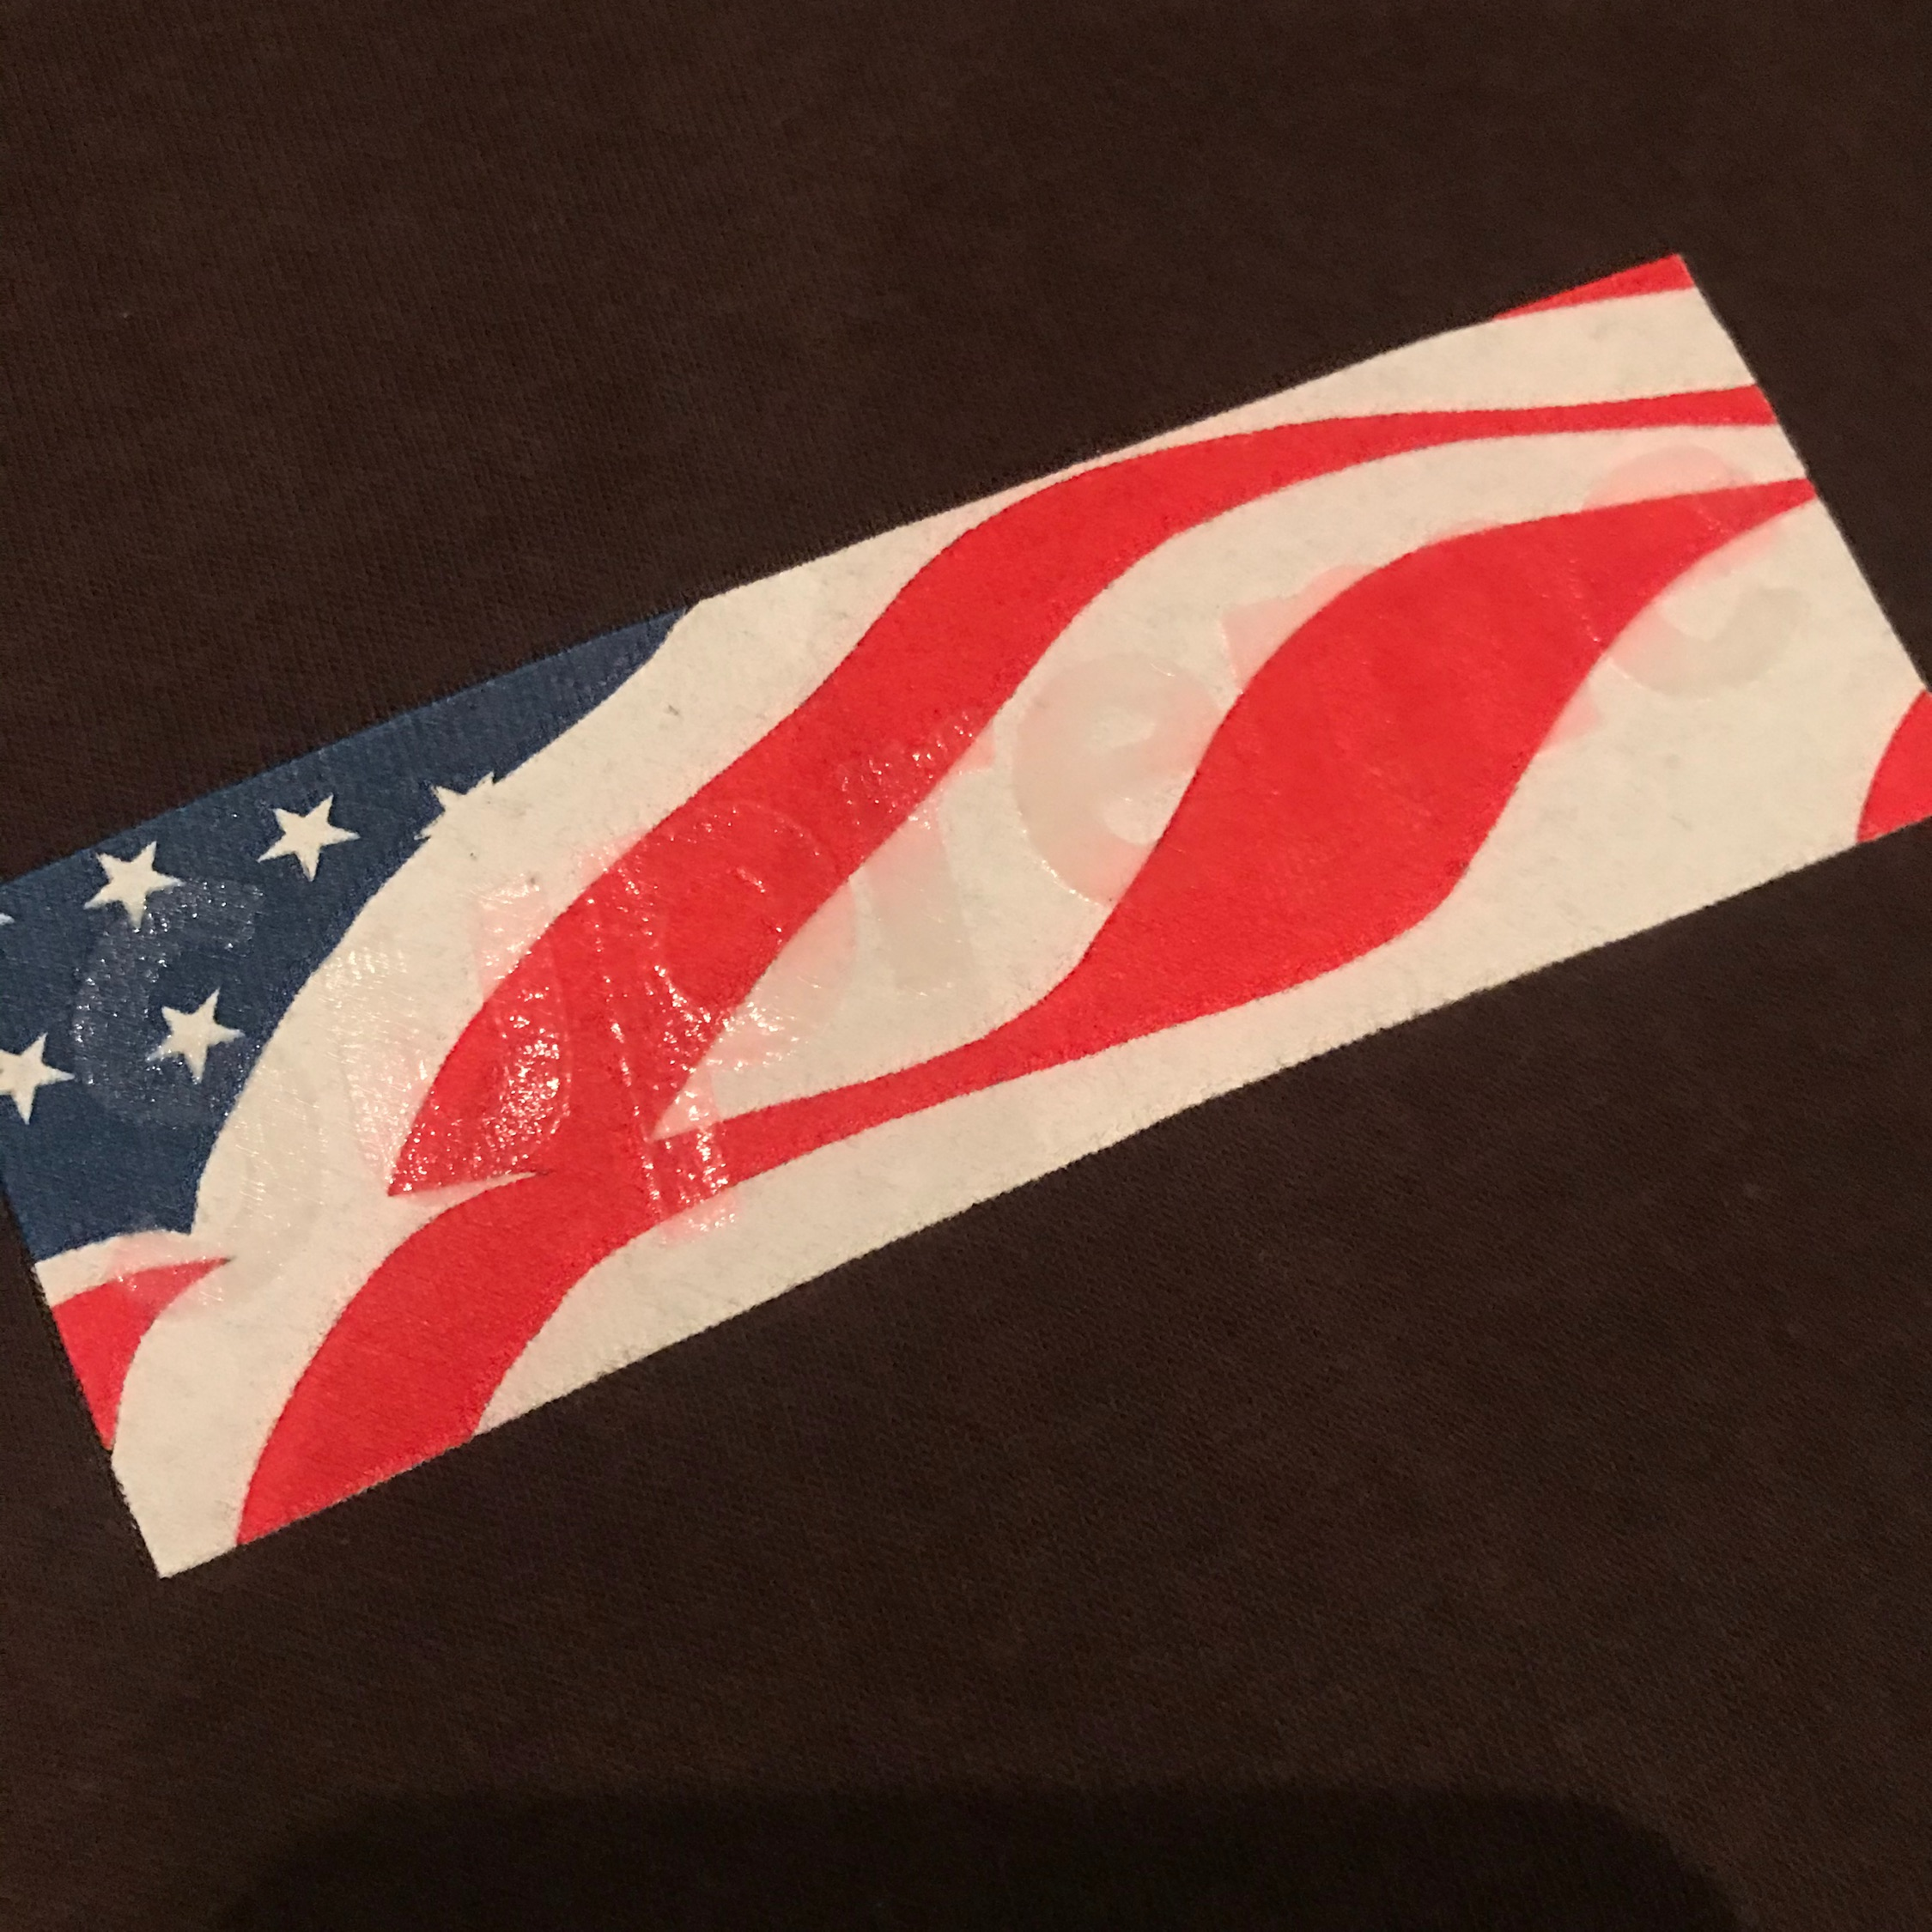 Supreme 9/11 Box Logo Tee In Brown Size Xlarge!.